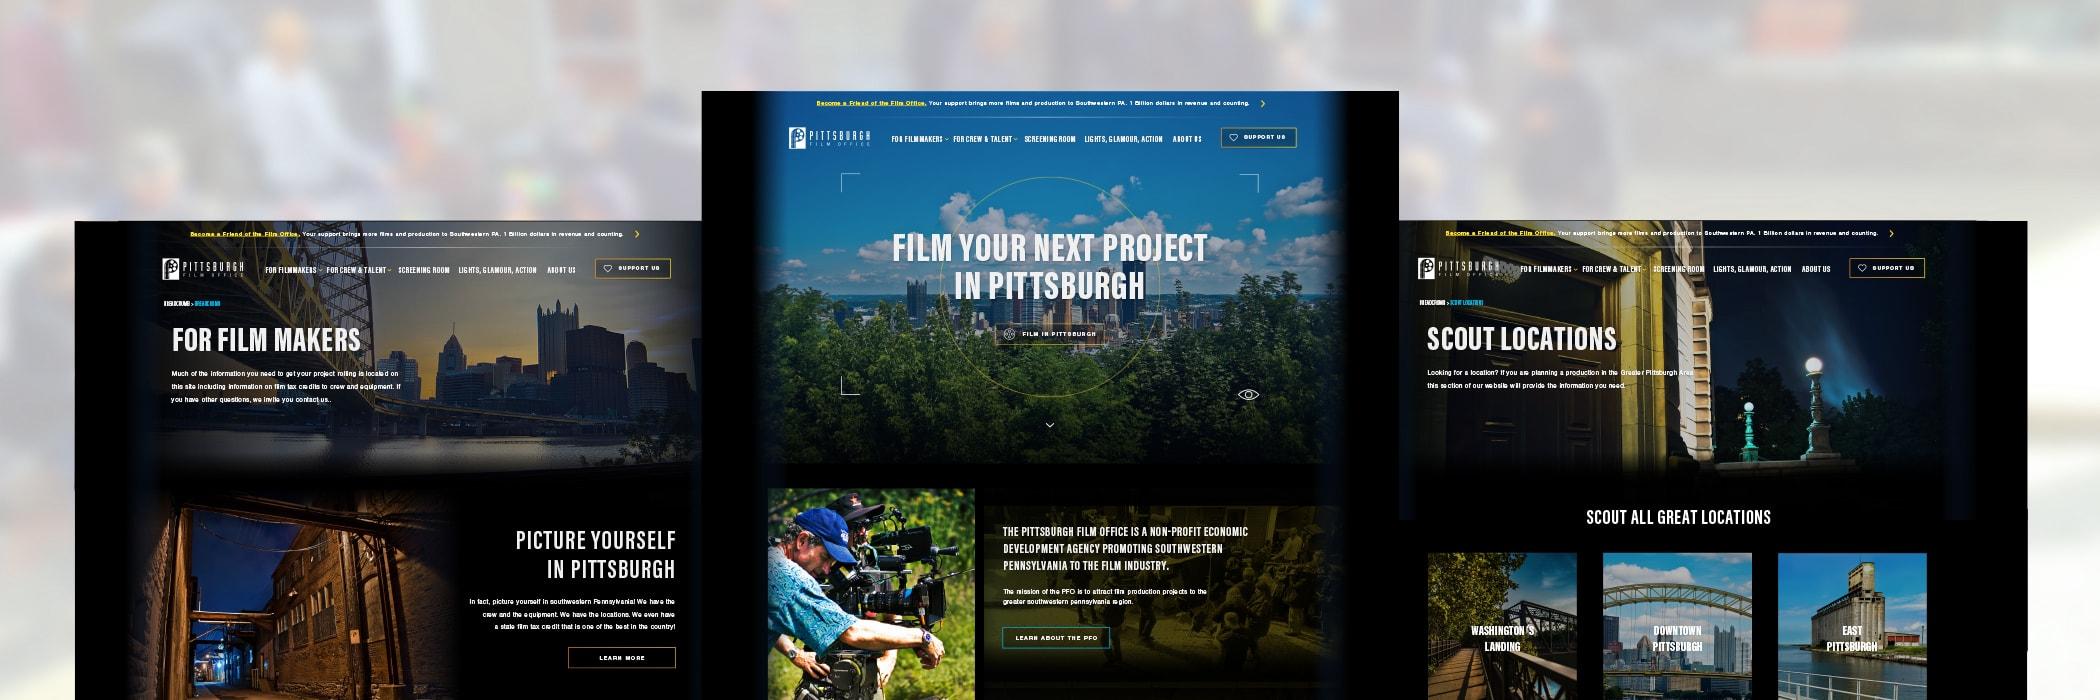 Pittsburgh Film Office Brand Website